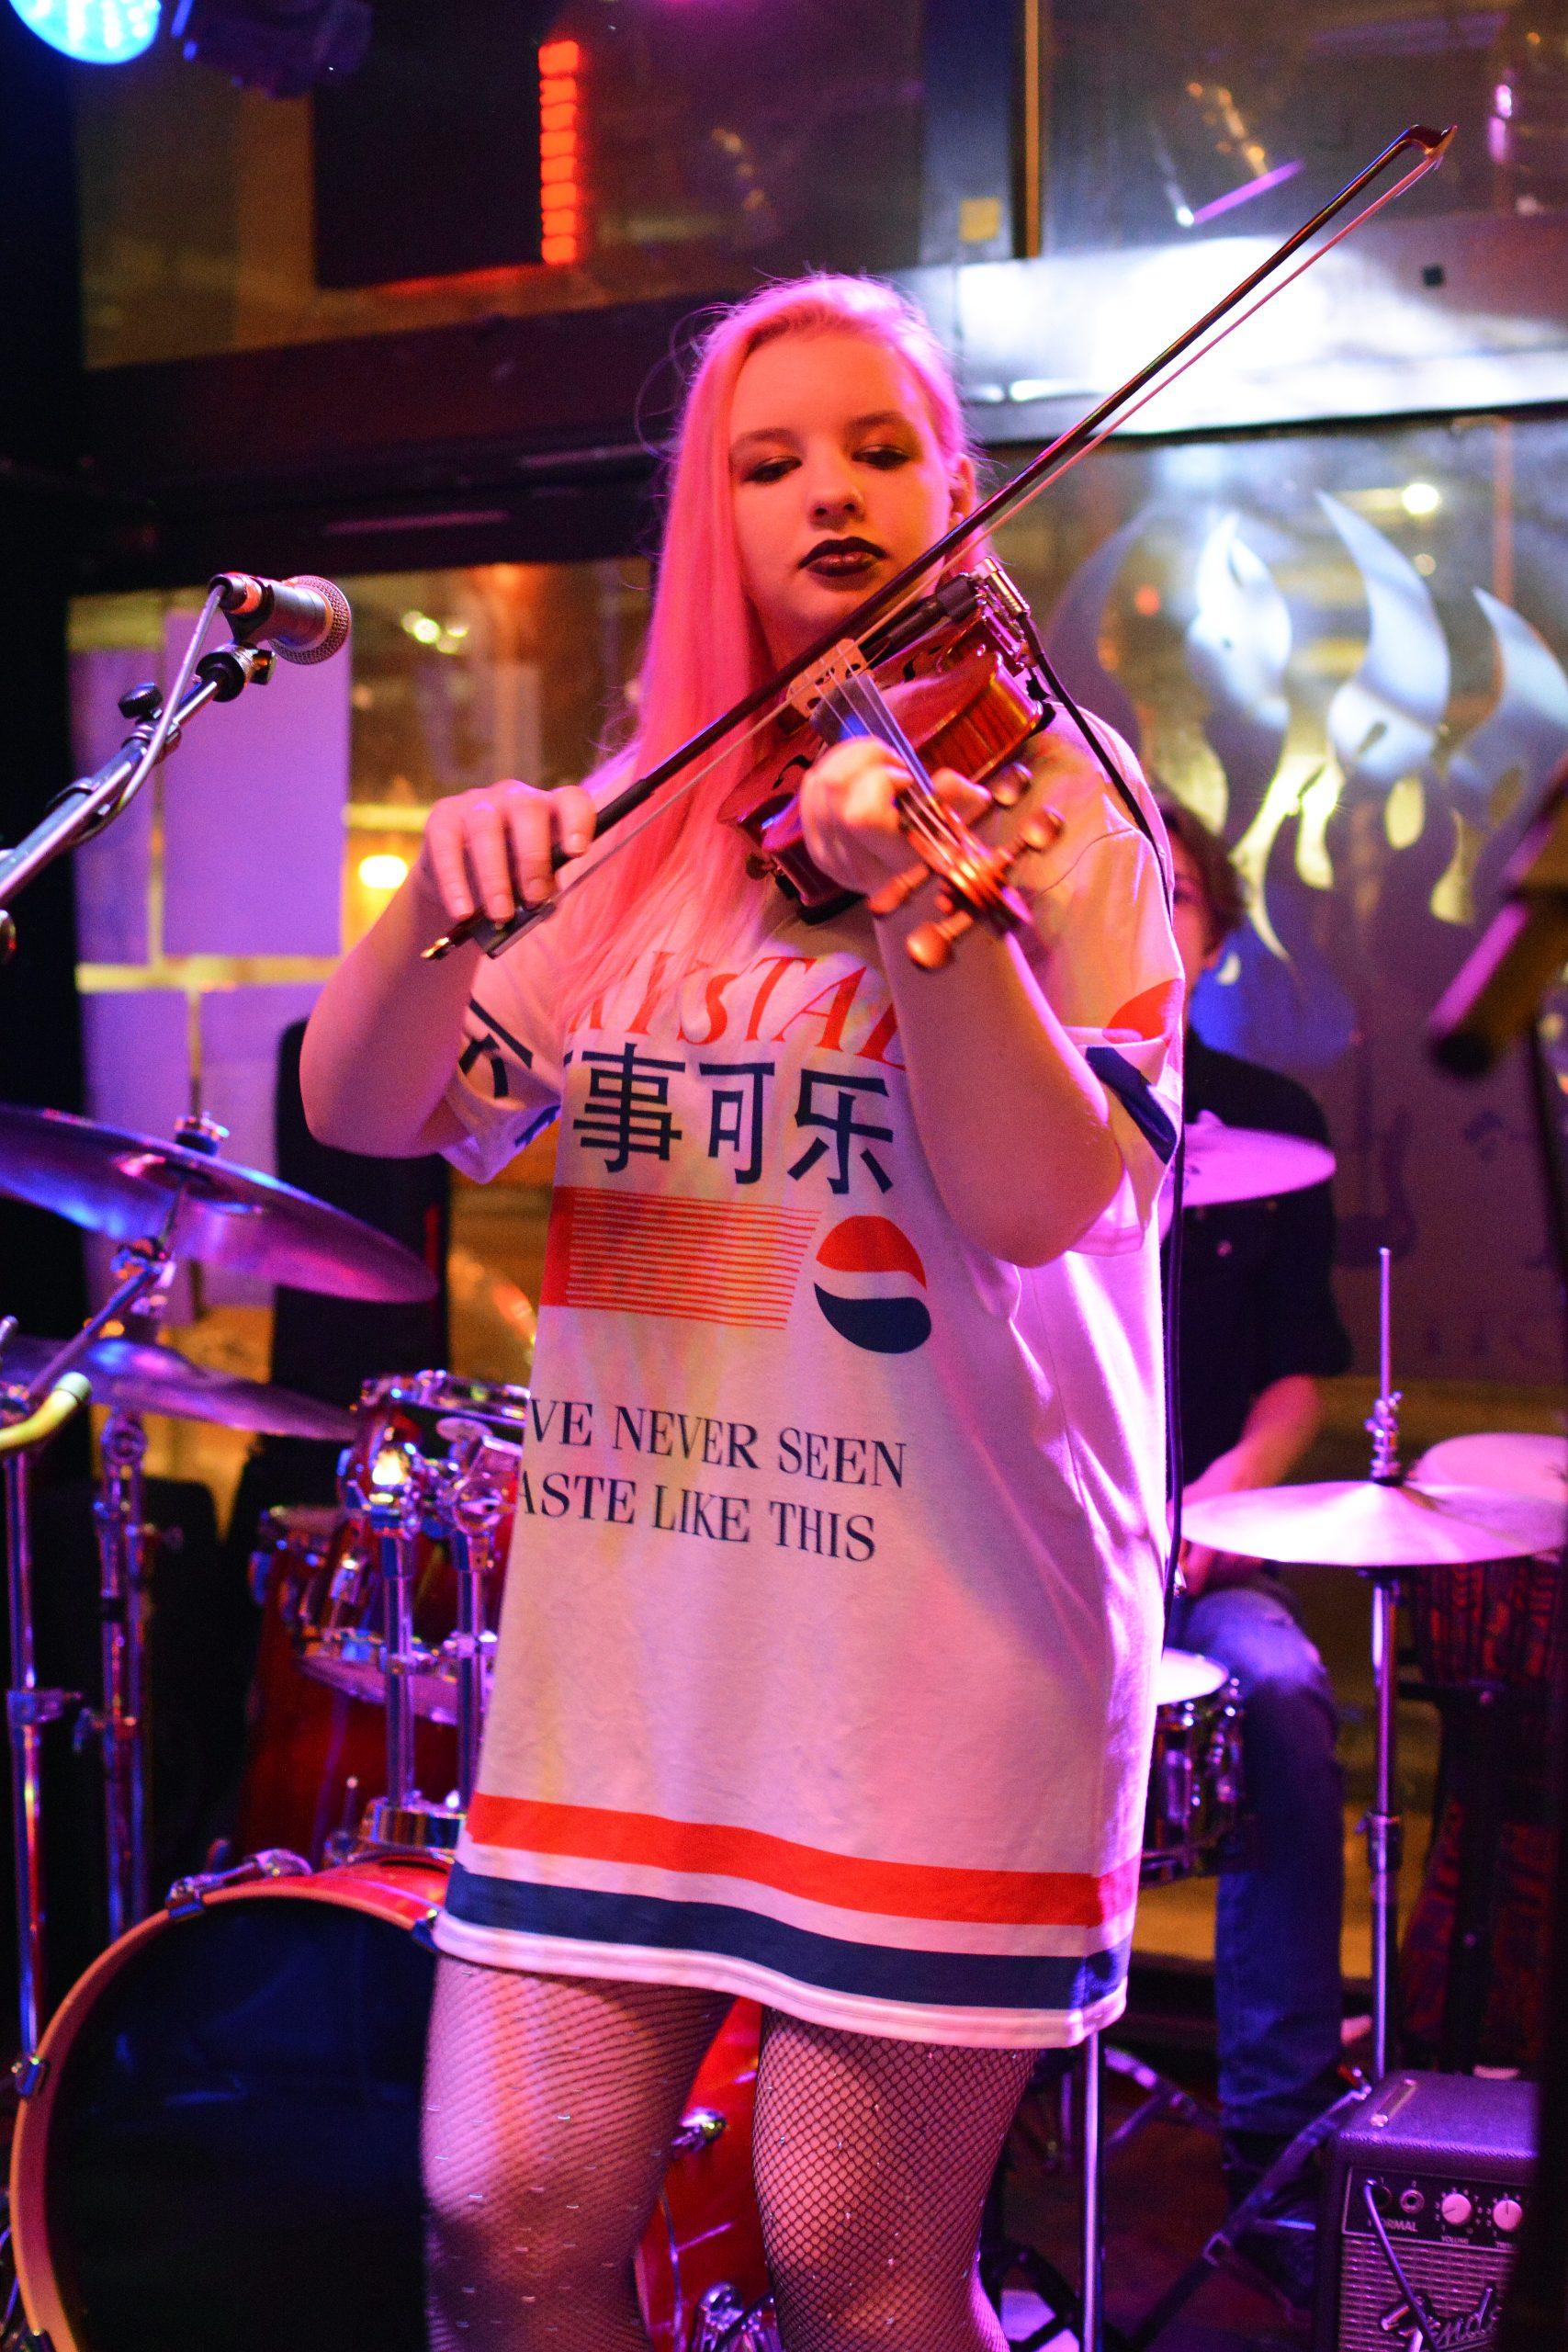 Emma Bird plays the fiddle